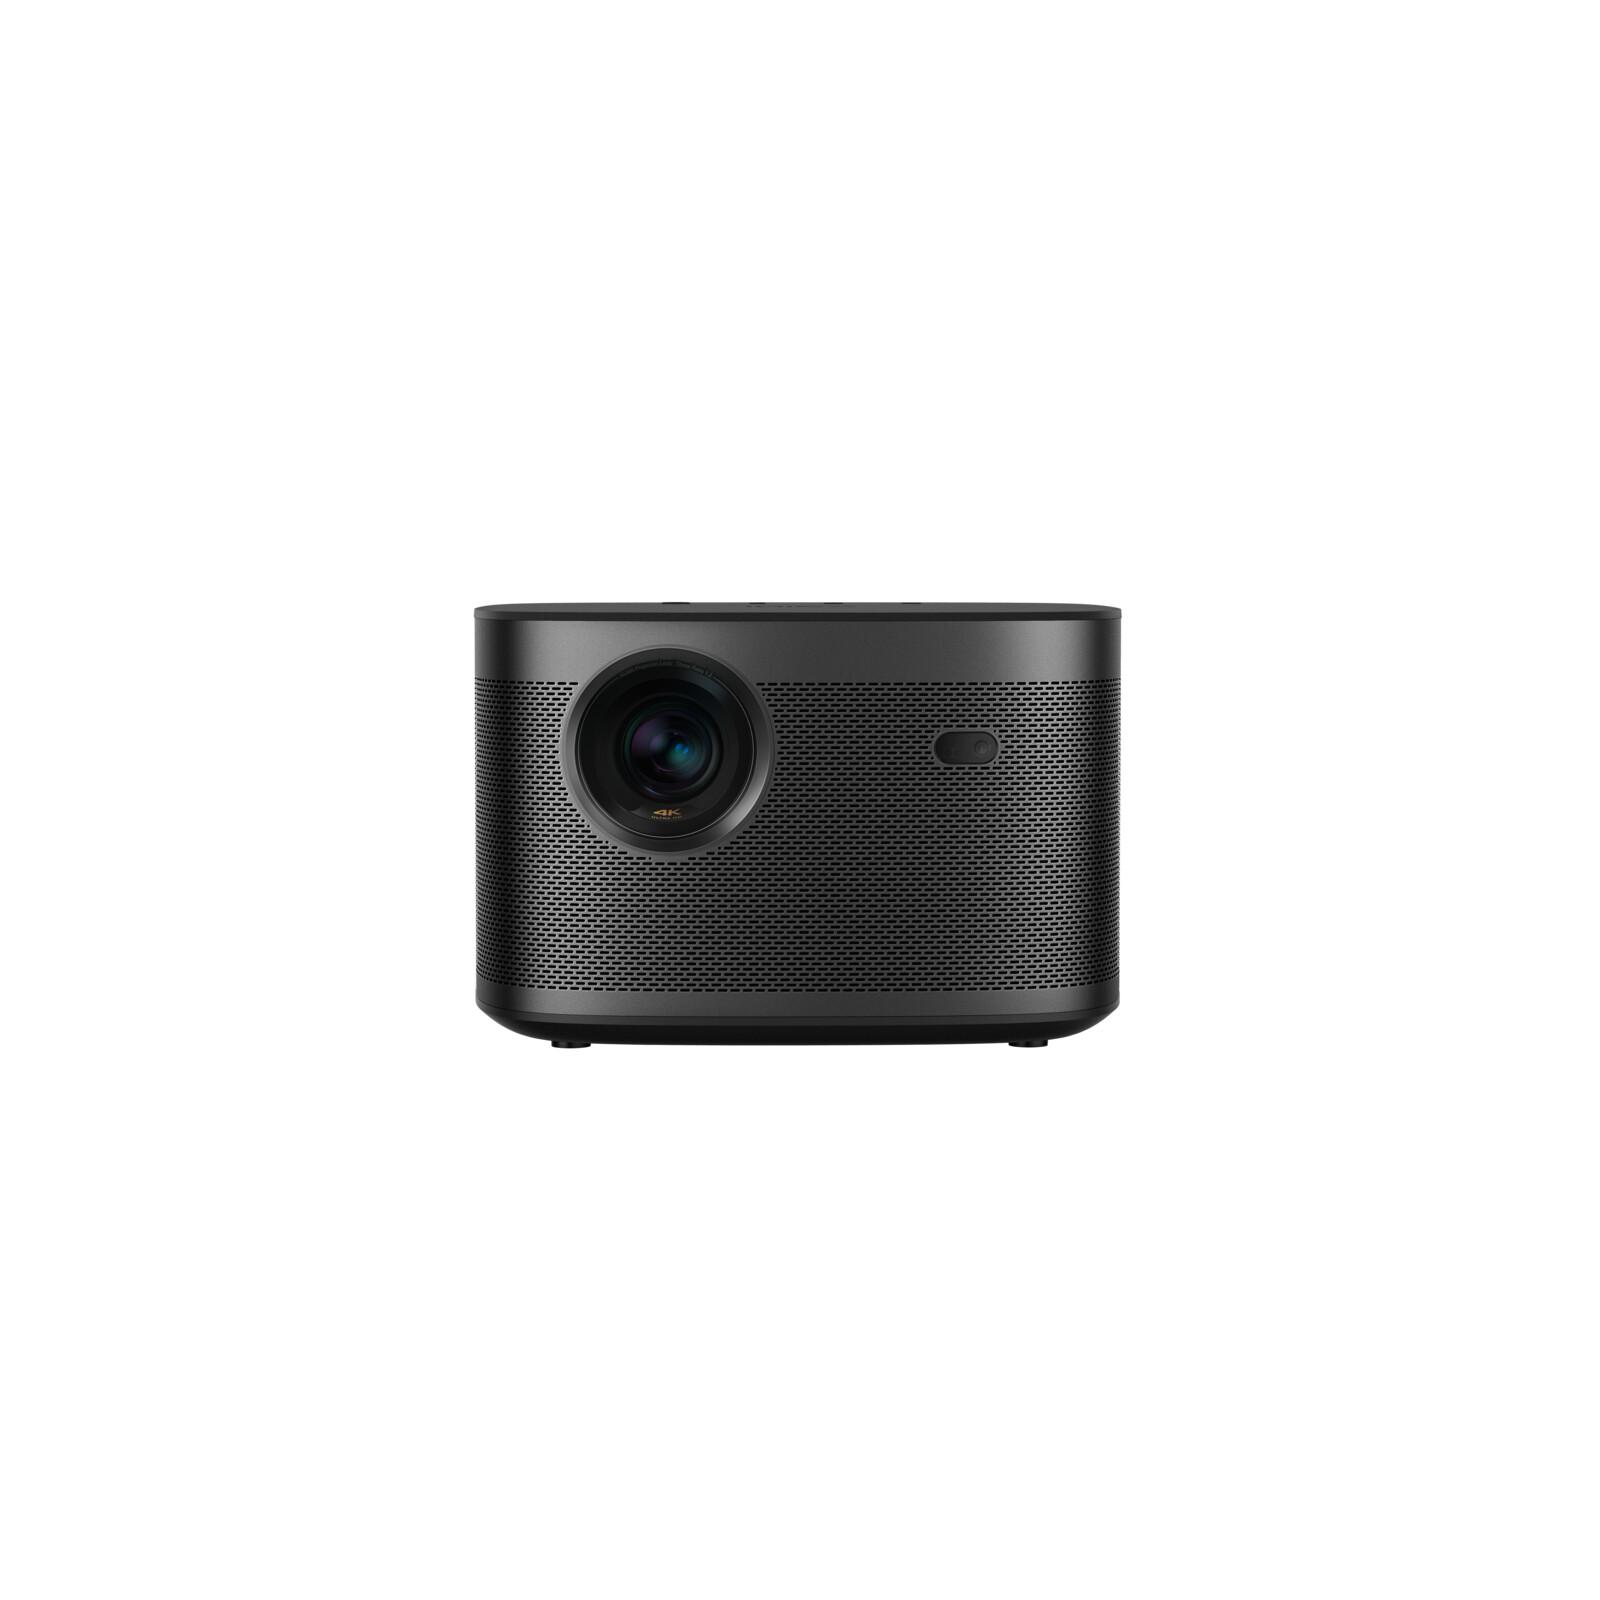 XGimi Horizon Pro 2200LM 4K Beamer